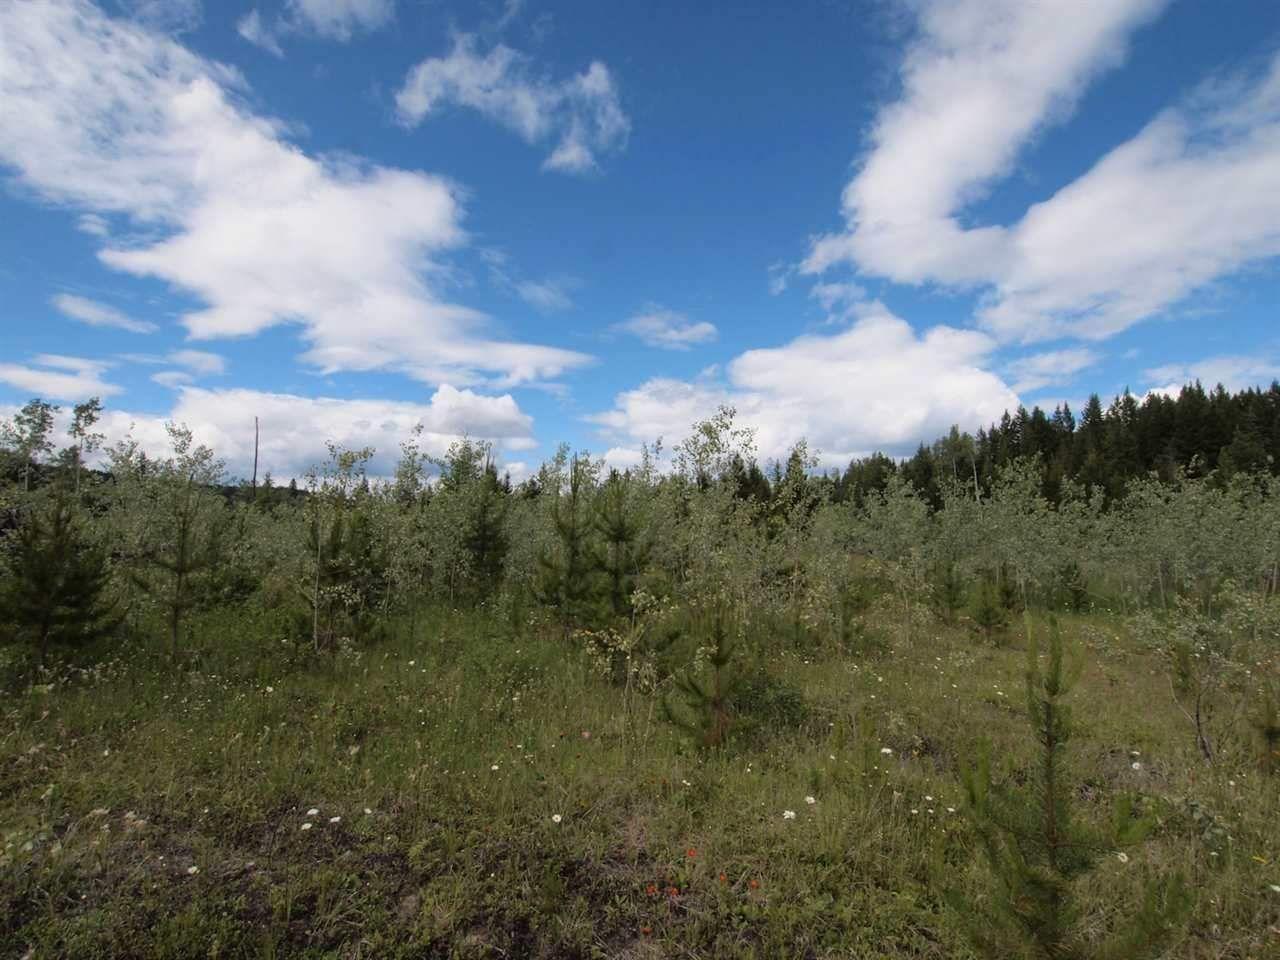 Photo 5: Photos: 4573 BAKKEN Road: Forest Grove Land for sale (100 Mile House (Zone 10))  : MLS®# R2377308